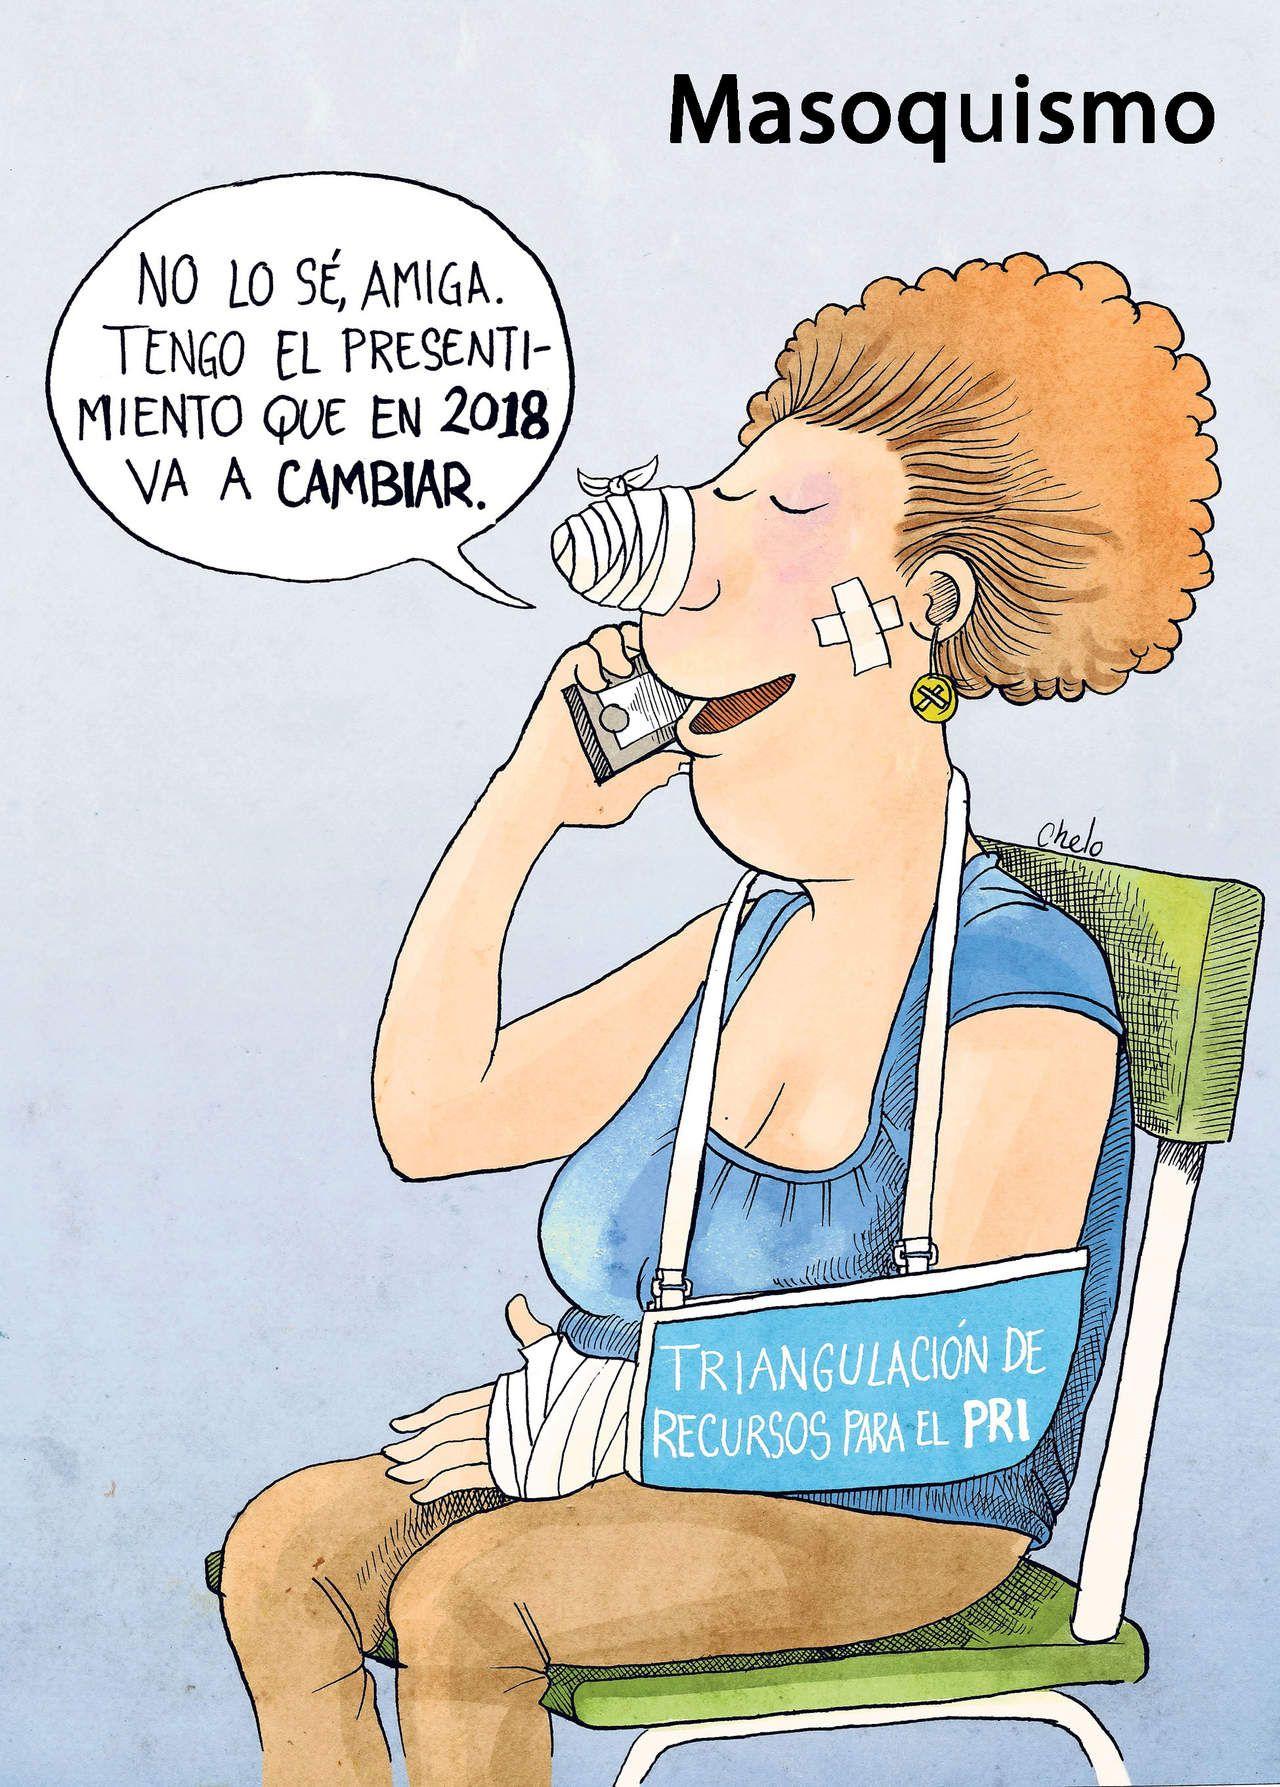 Masoquismo Por Chelo Caricatura Editorial Editorial Amigo